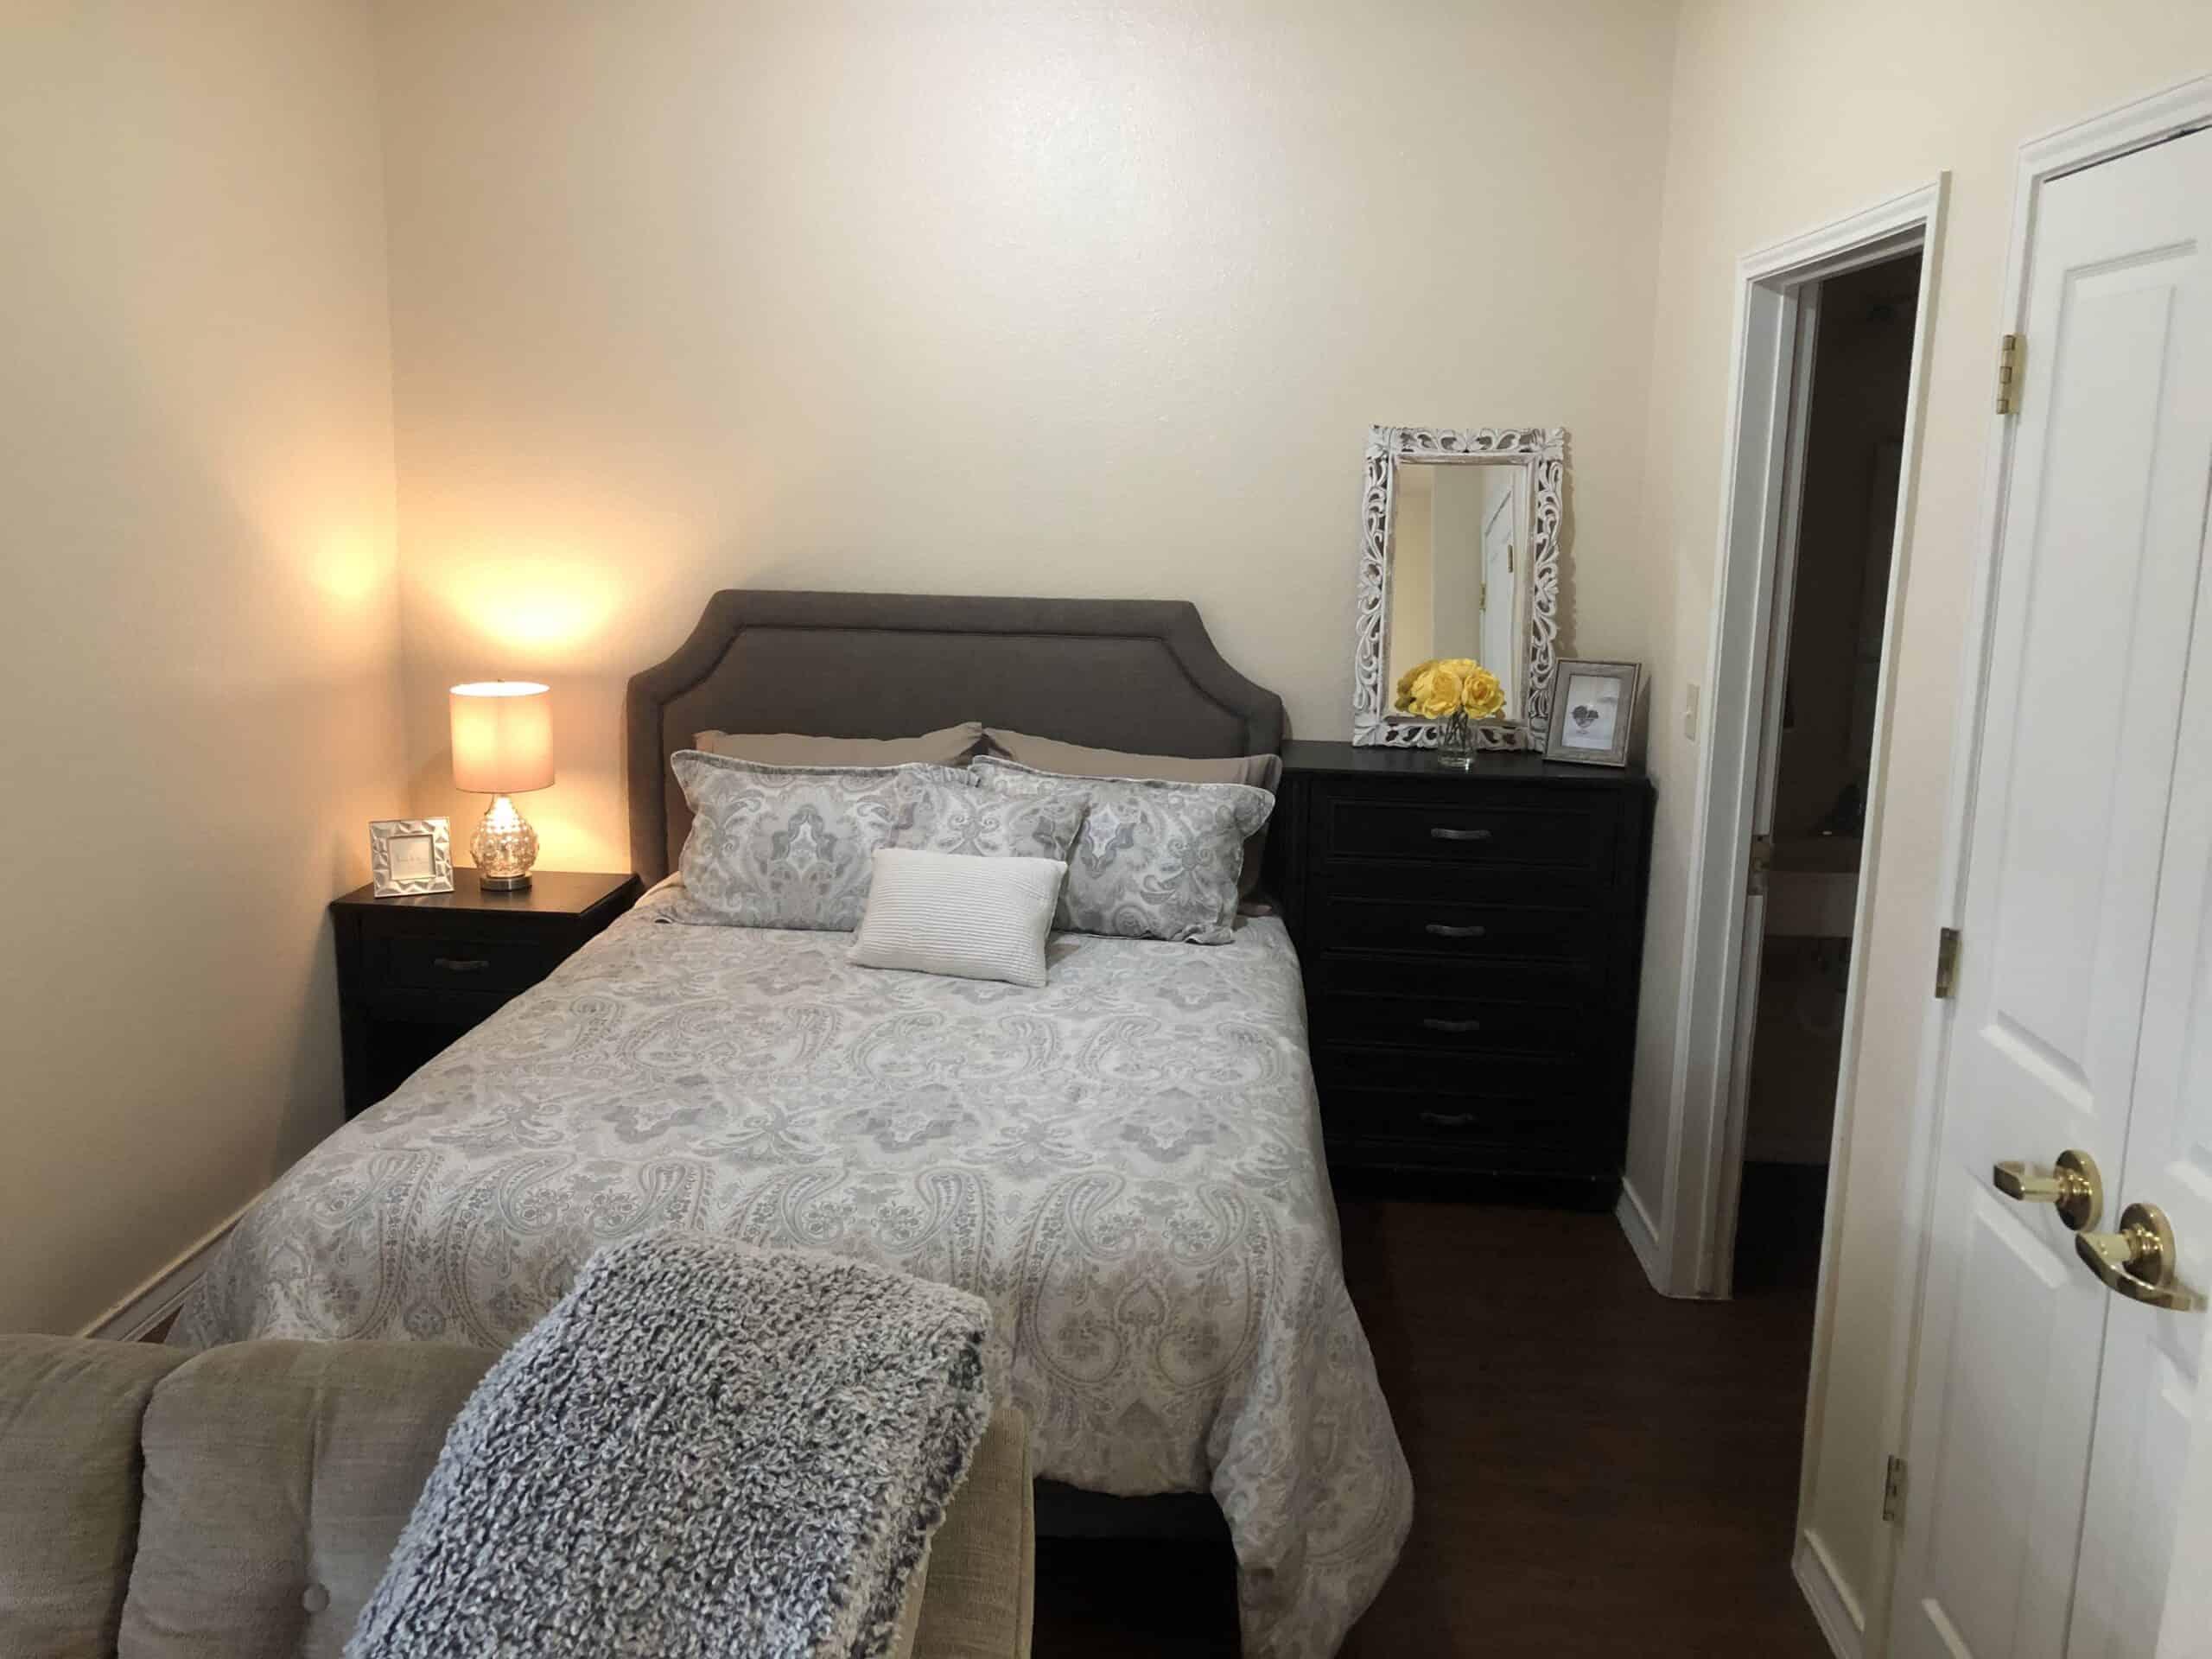 Model apartment bedroom at Good Tree senior living in Stephenville, Texas